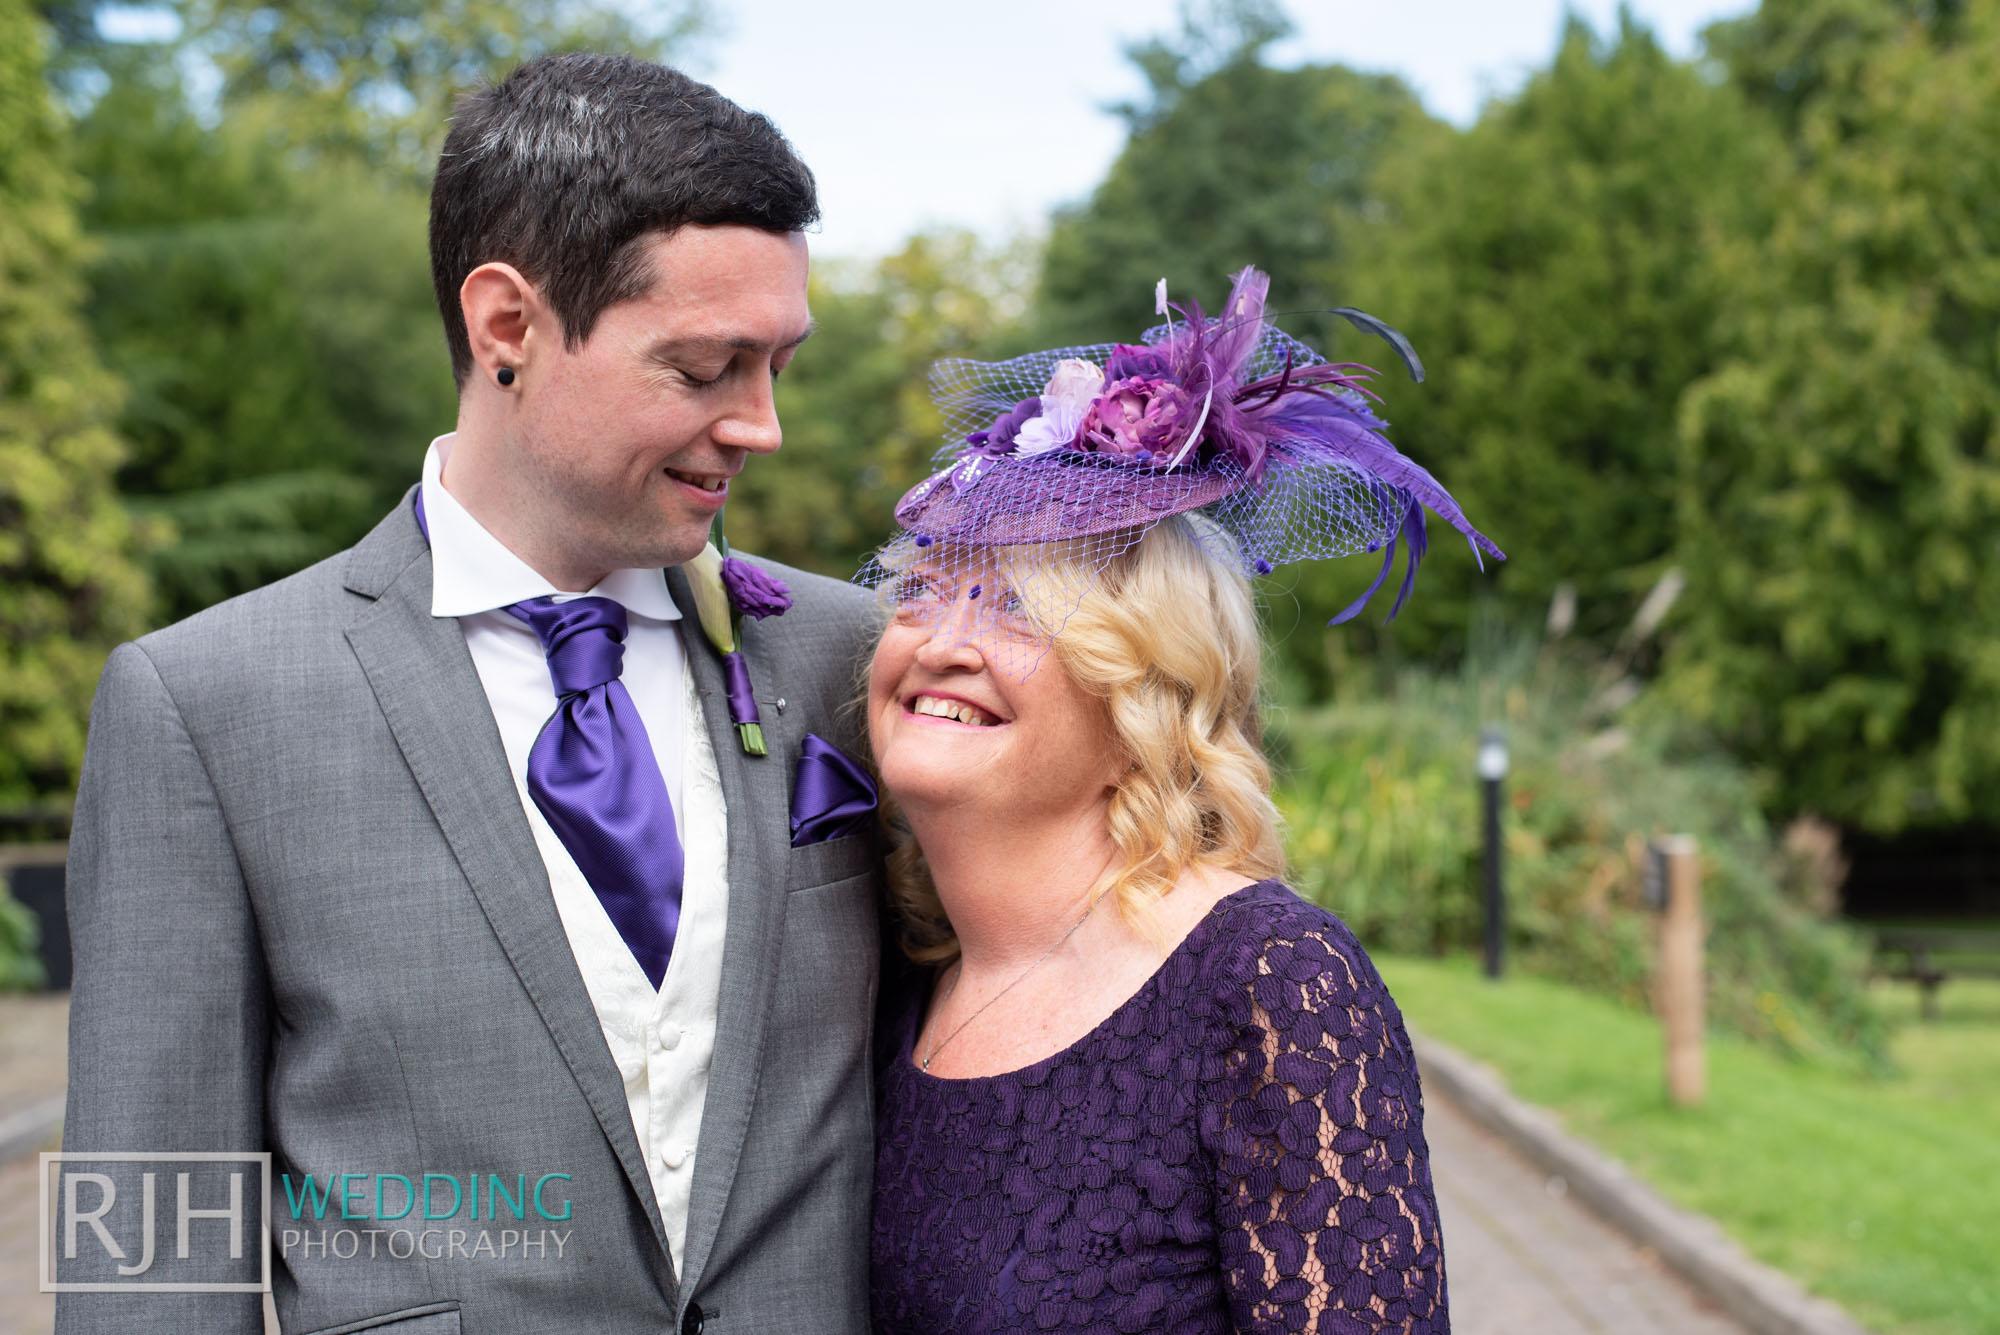 Oulton Hall Wedding Photography_Goodwill-Hall_011_DSC_3030.jpg